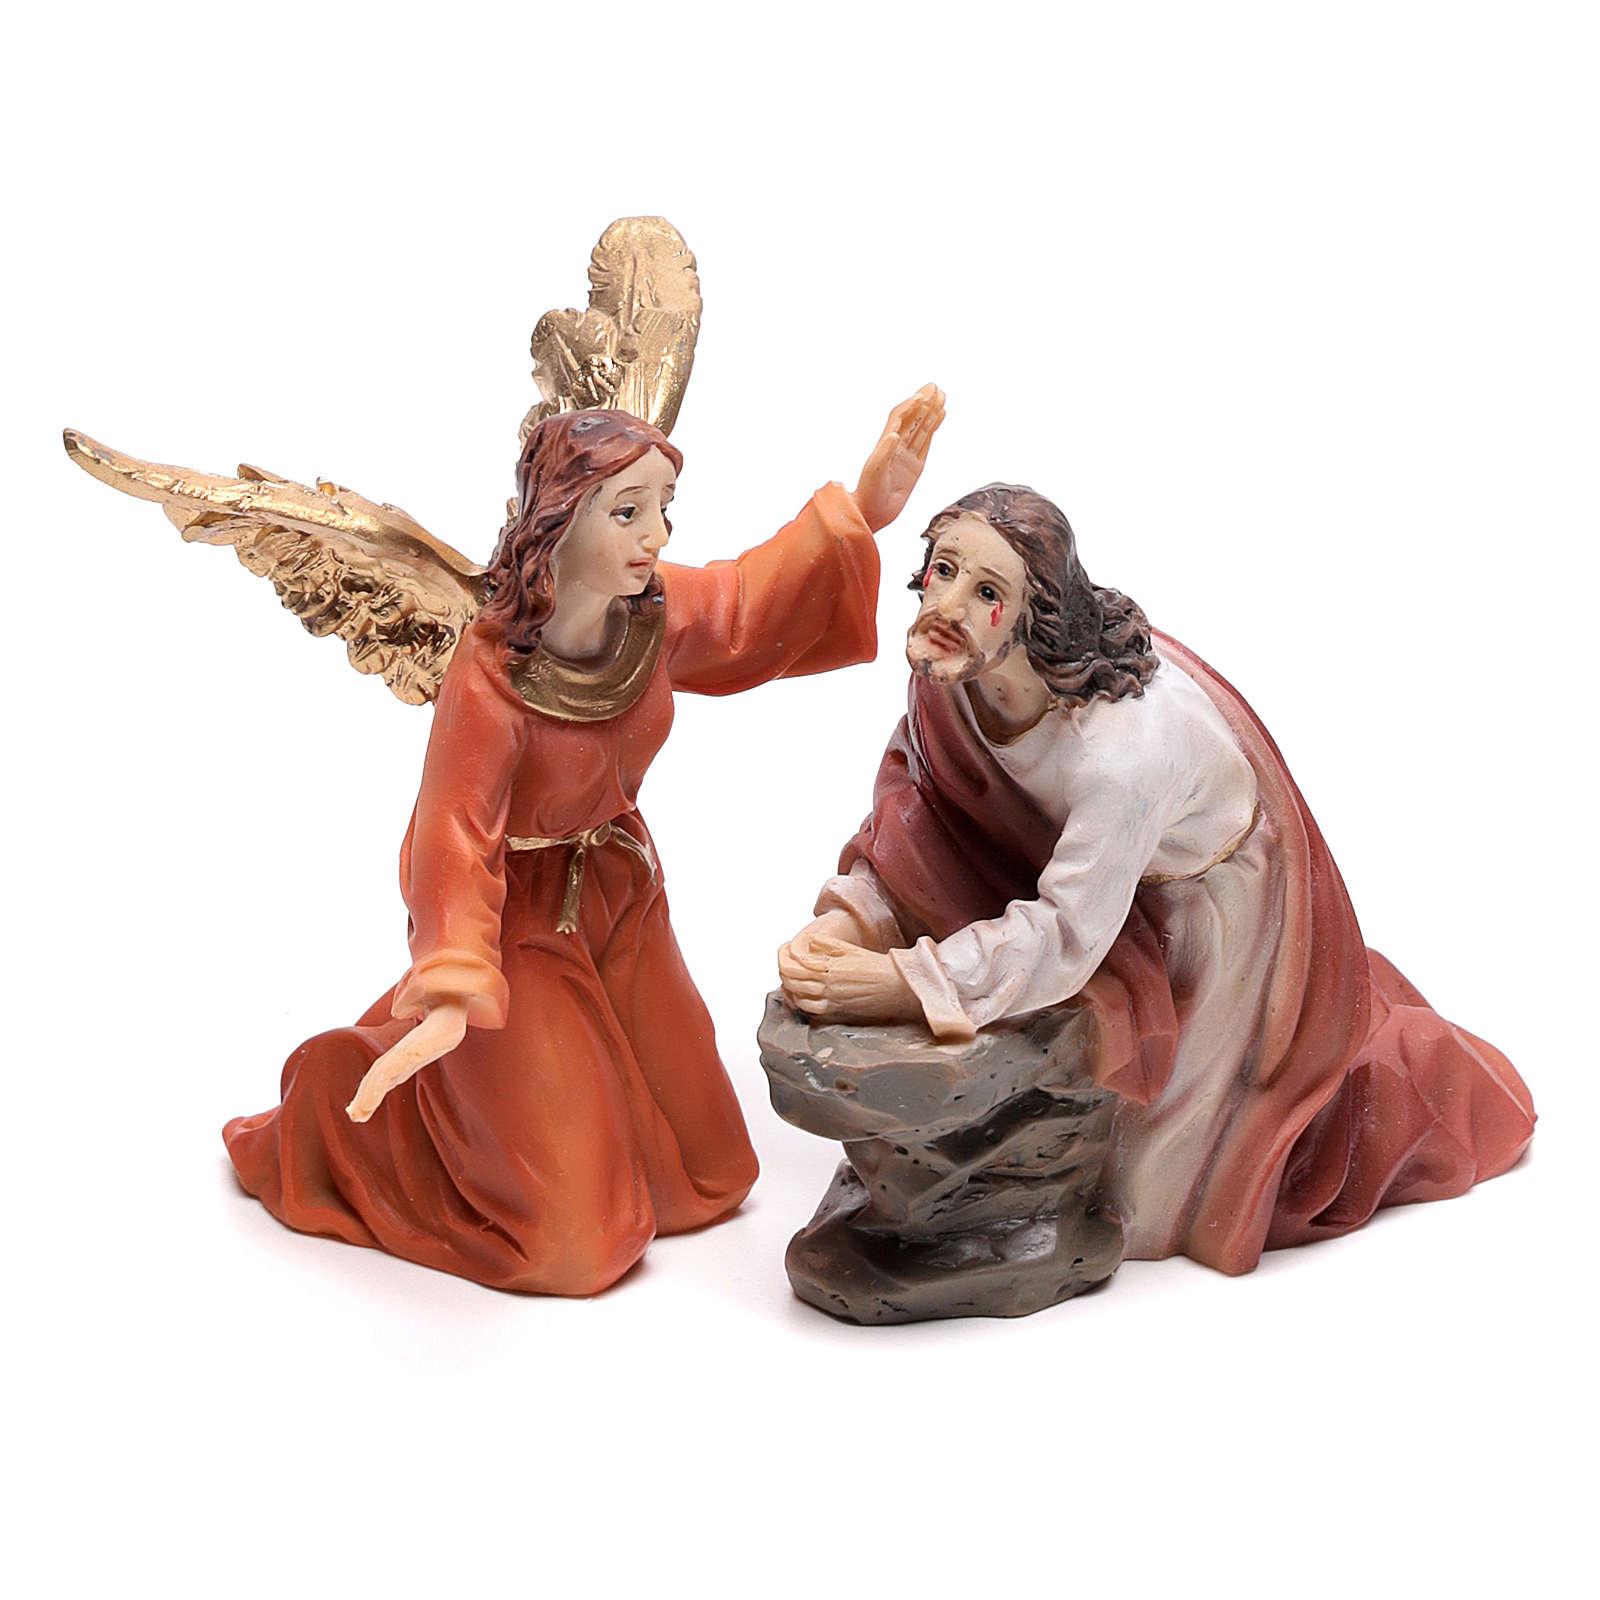 Passion of Christ, Gethsemane 9 cm 4